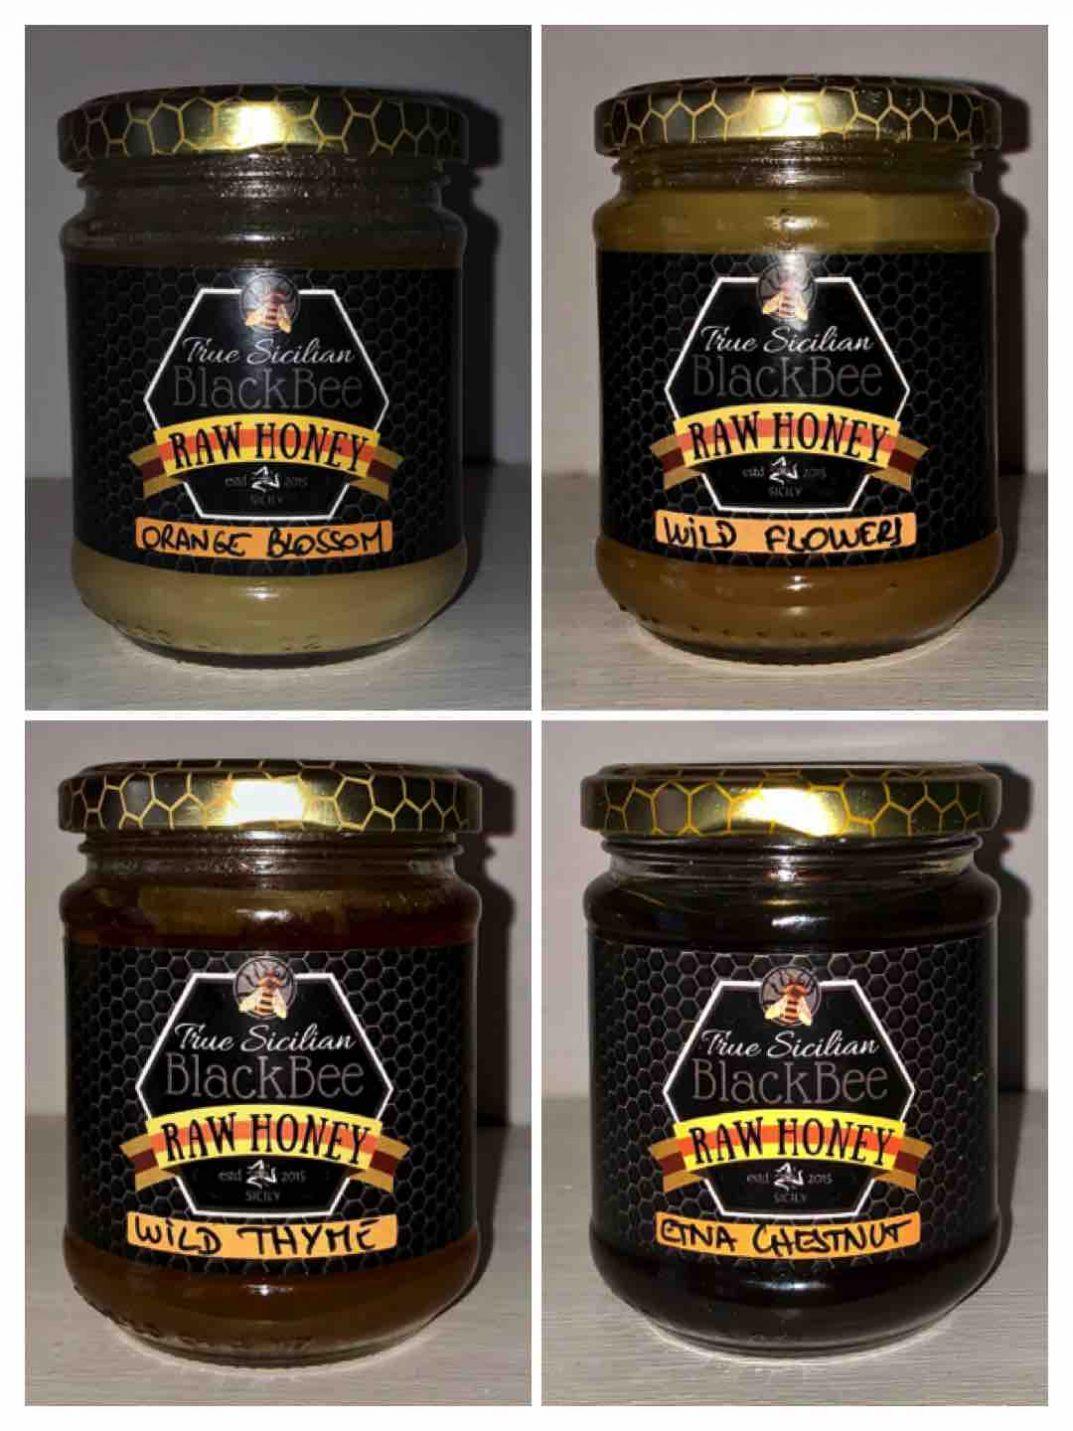 Sicilian Black Bee Raw Honey